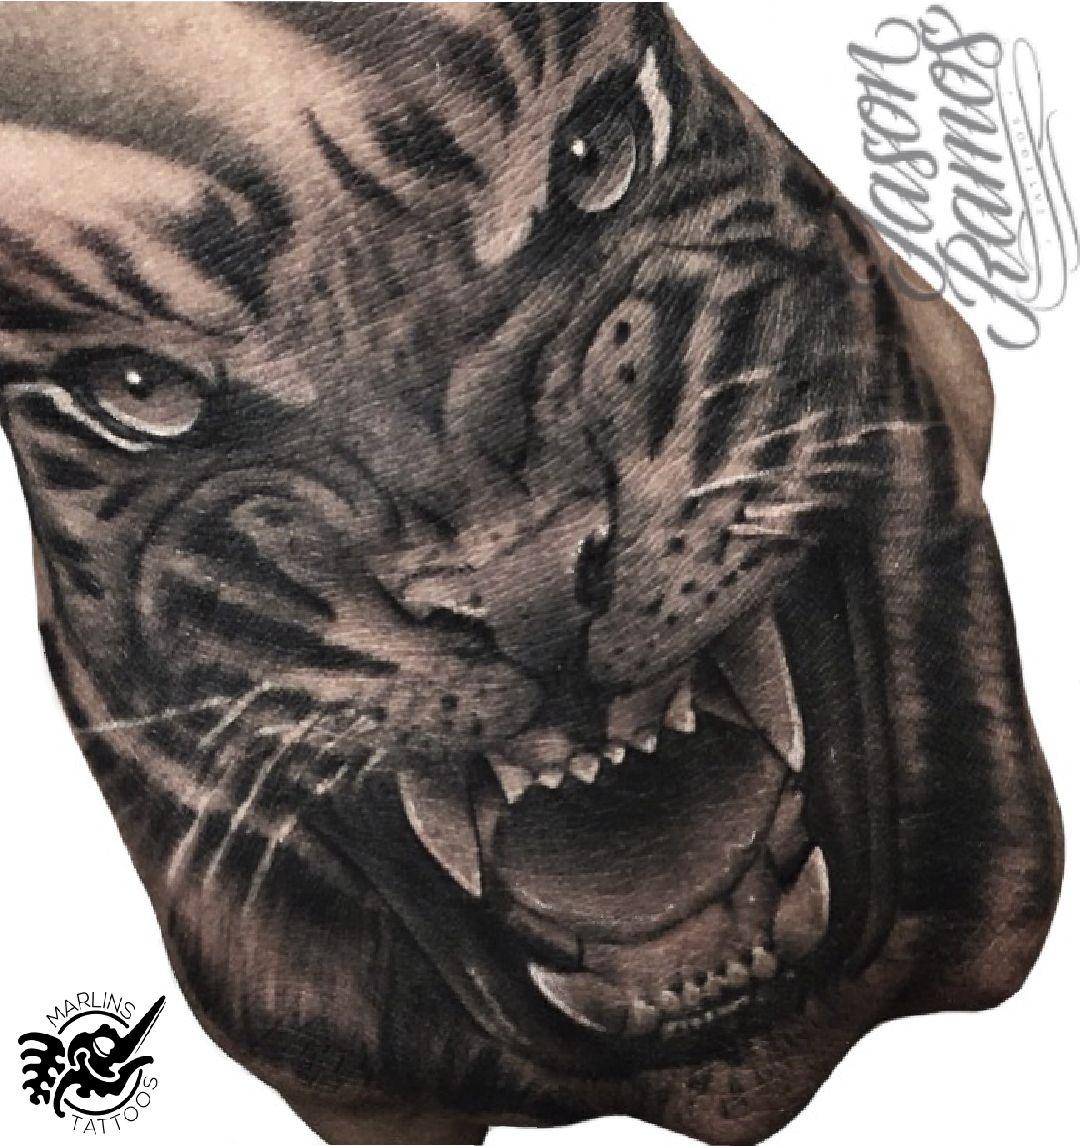 Tiger Hand Tattoo Marlins Tattoos Tiger Hand Tattoo Hand Tattoos Tattoos